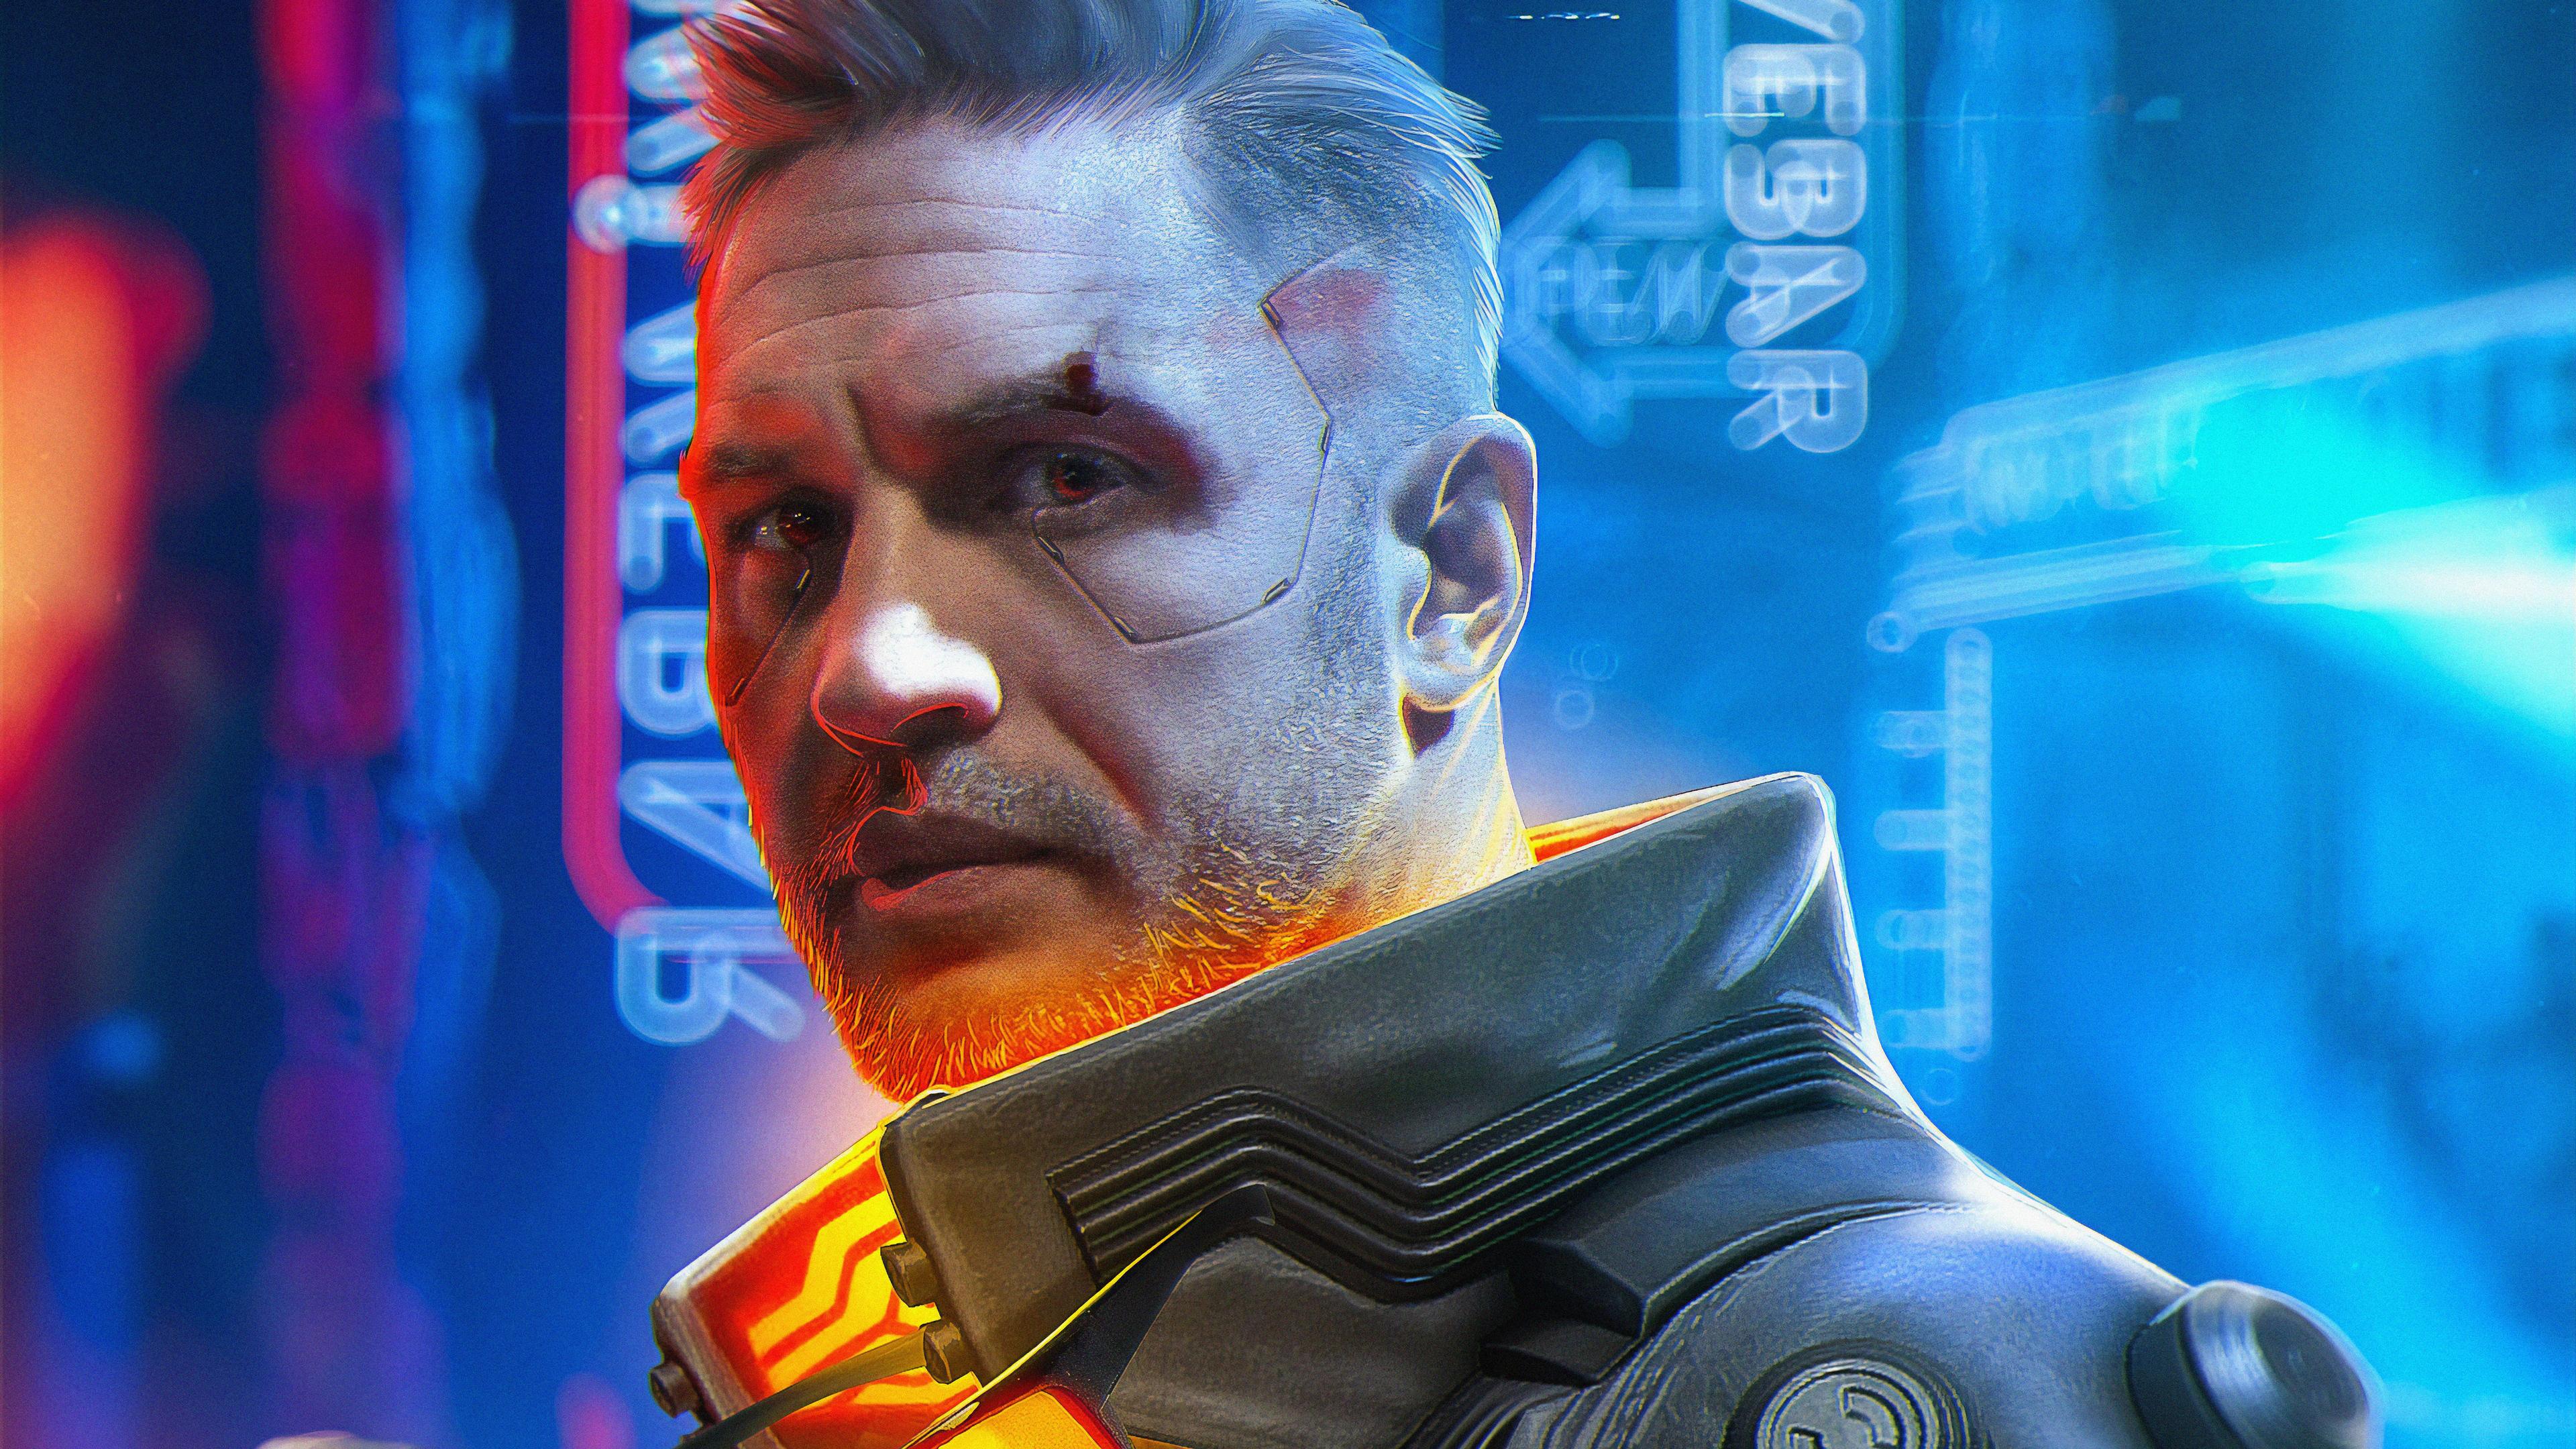 tom hardy cyberpunk 2077 1568056876 - Tom Hardy Cyberpunk 2077 - xbox games wallpapers, tom hardy wallpapers, ps games wallpapers, pc games wallpapers, hd-wallpapers, games wallpapers, cyberpunk 2077 wallpapers, 4k-wallpapers, 2020 games wallpapers